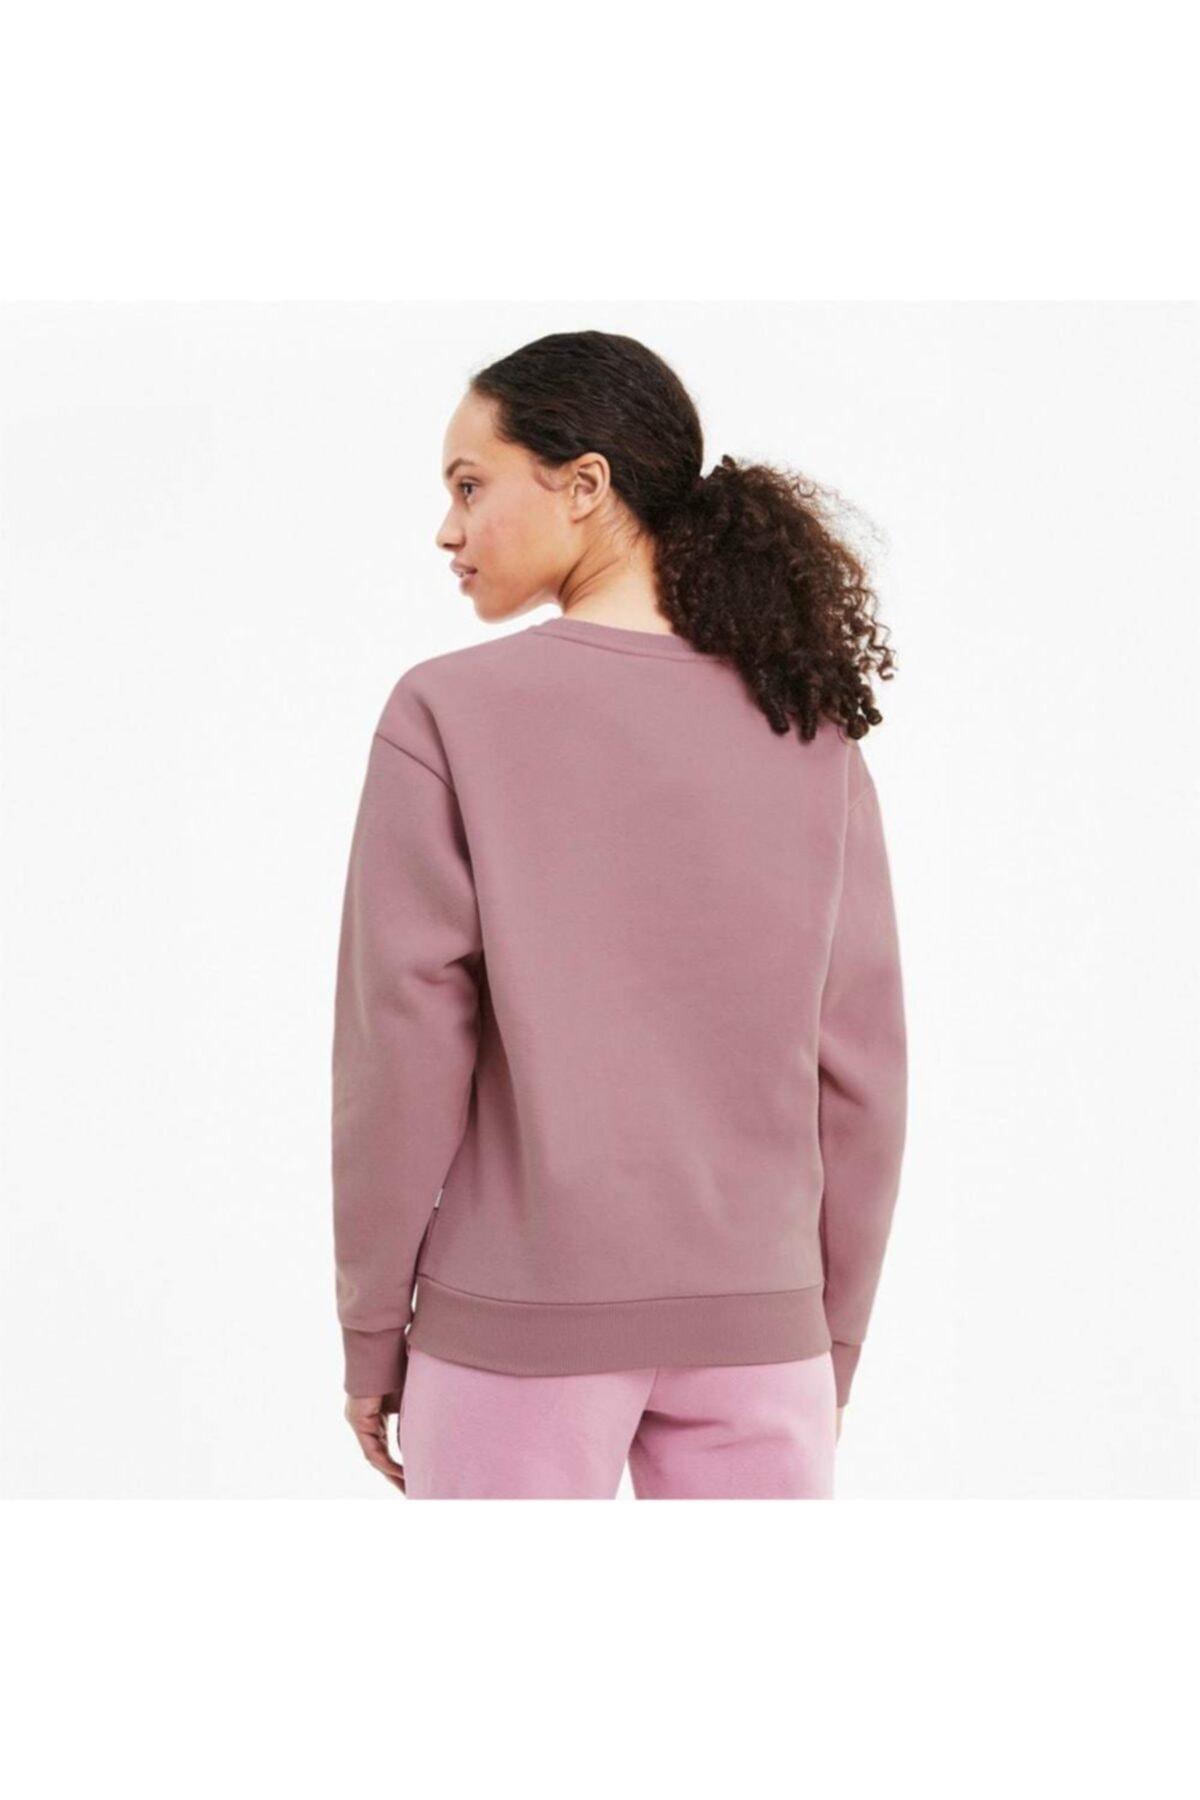 Puma MODERN BASICS CREW FL Pembe Kadın Sweatshirt 101119453 2